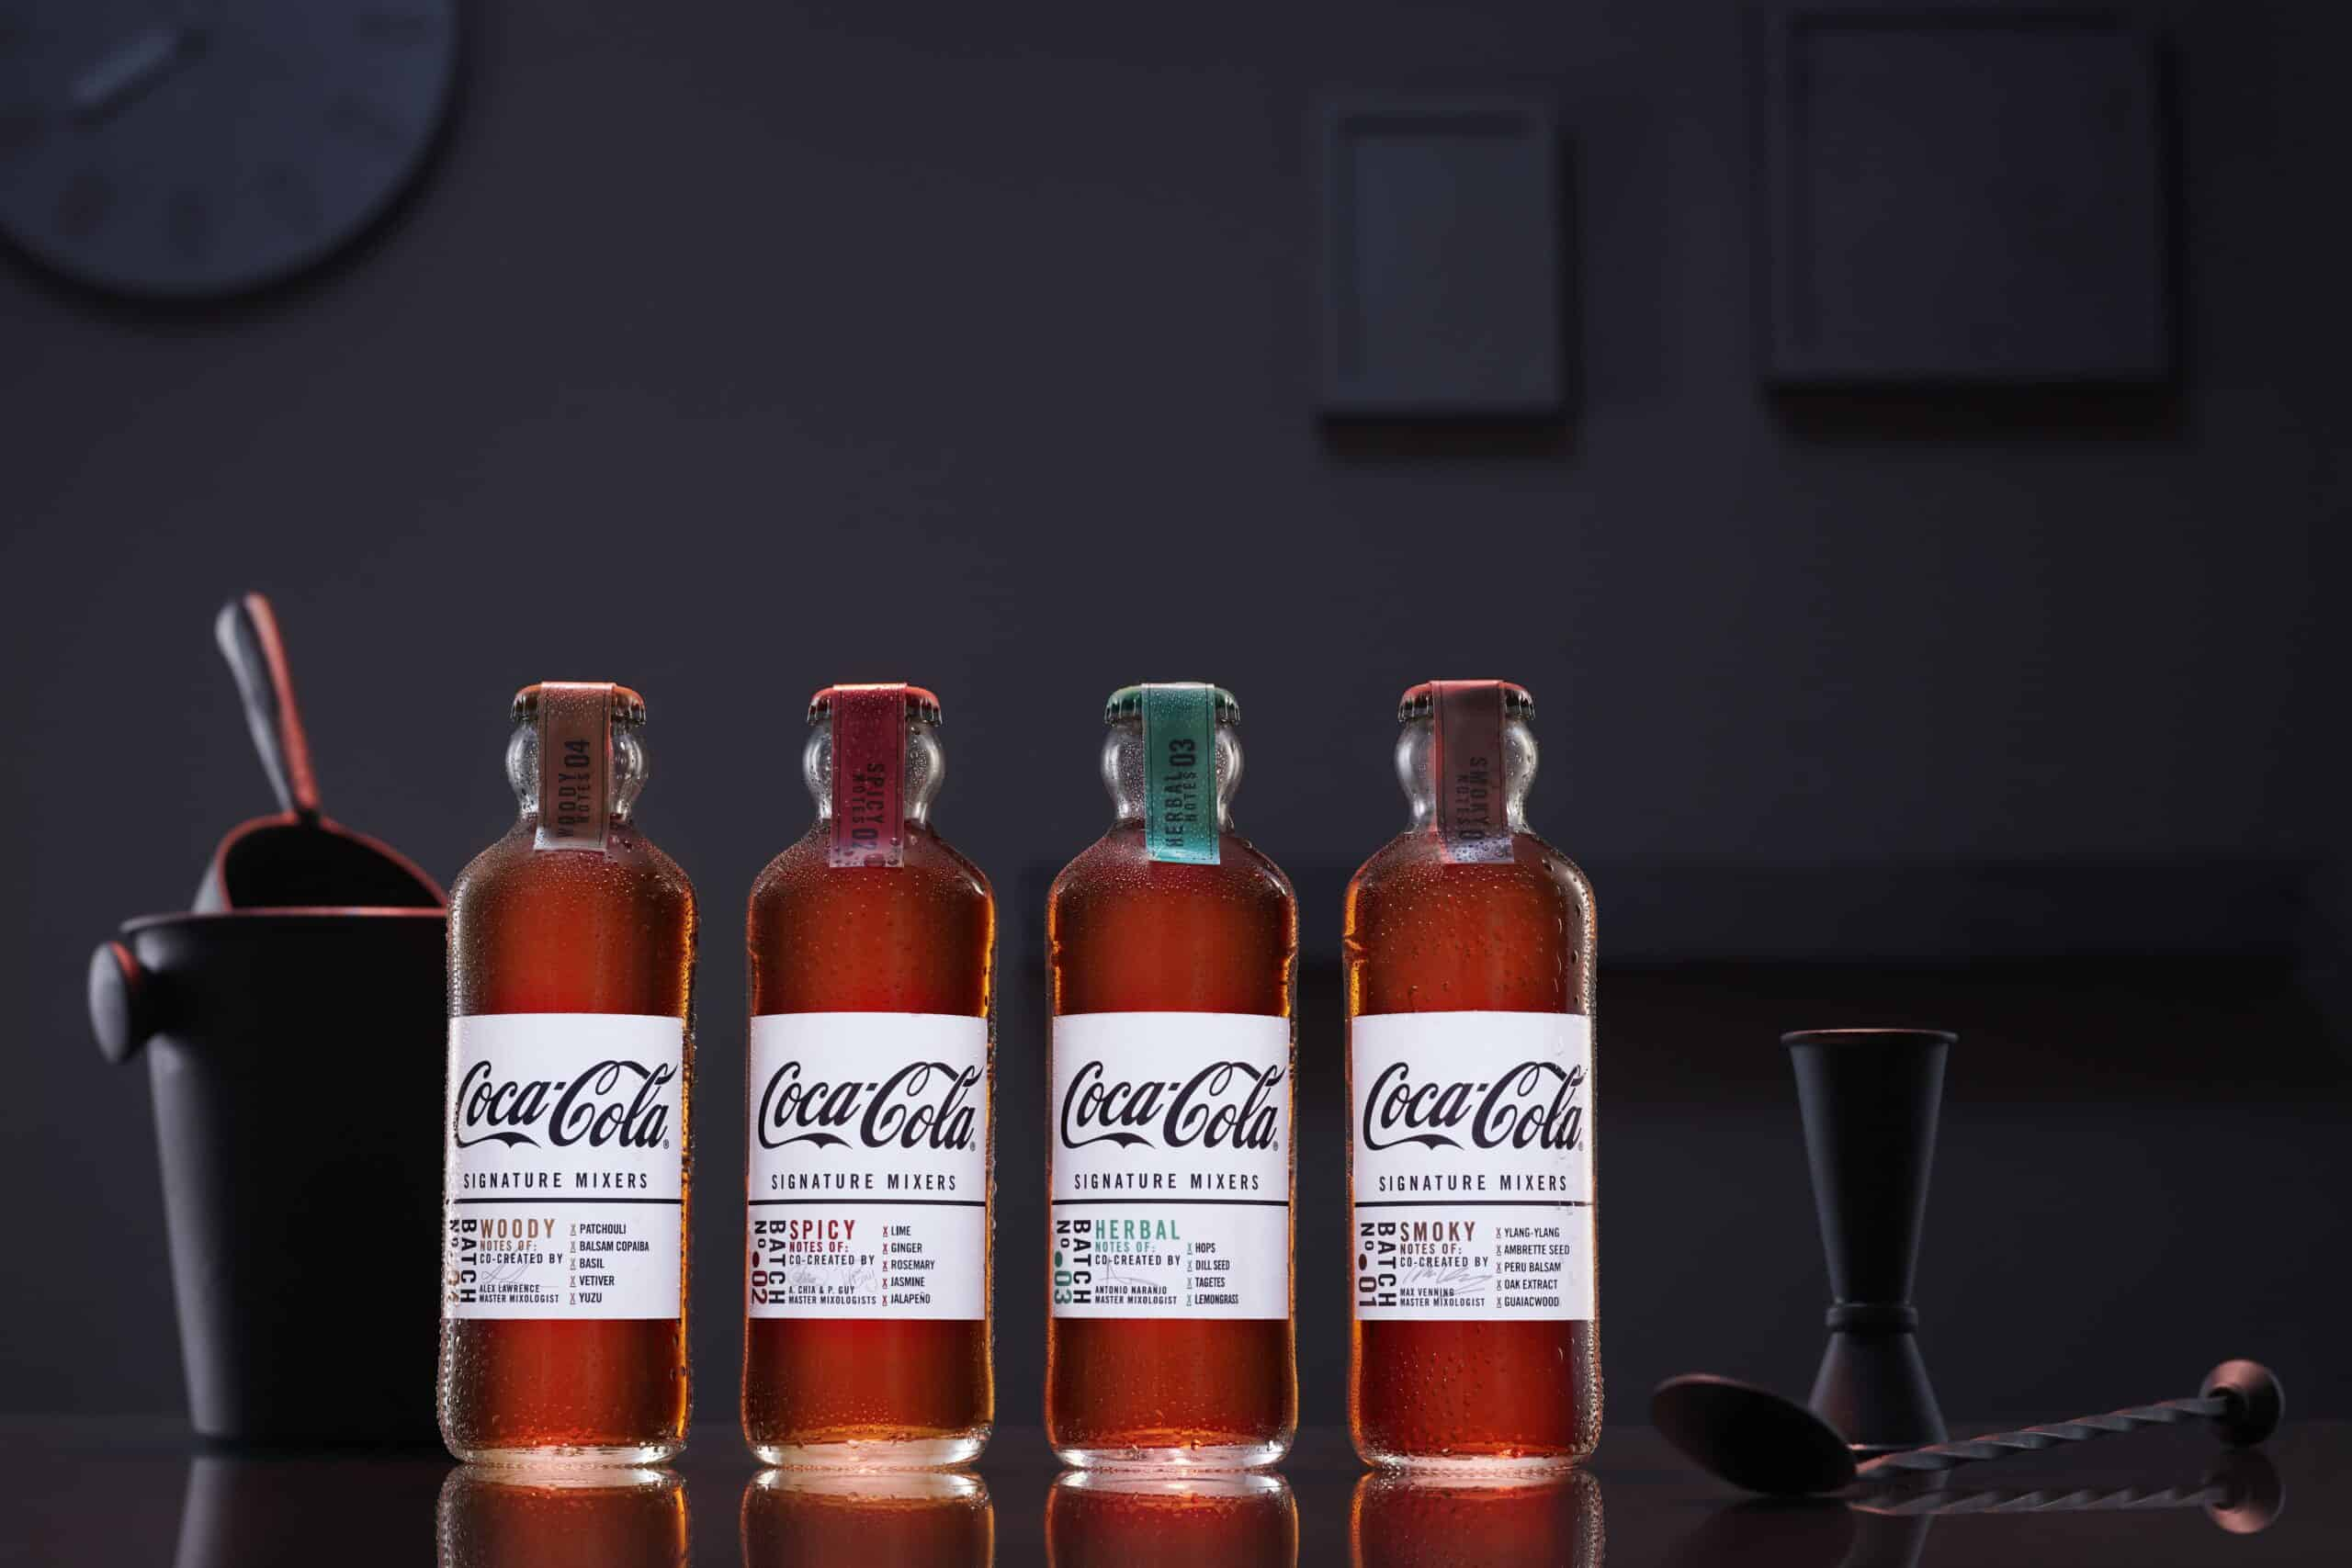 Mixen met Coca-Cola